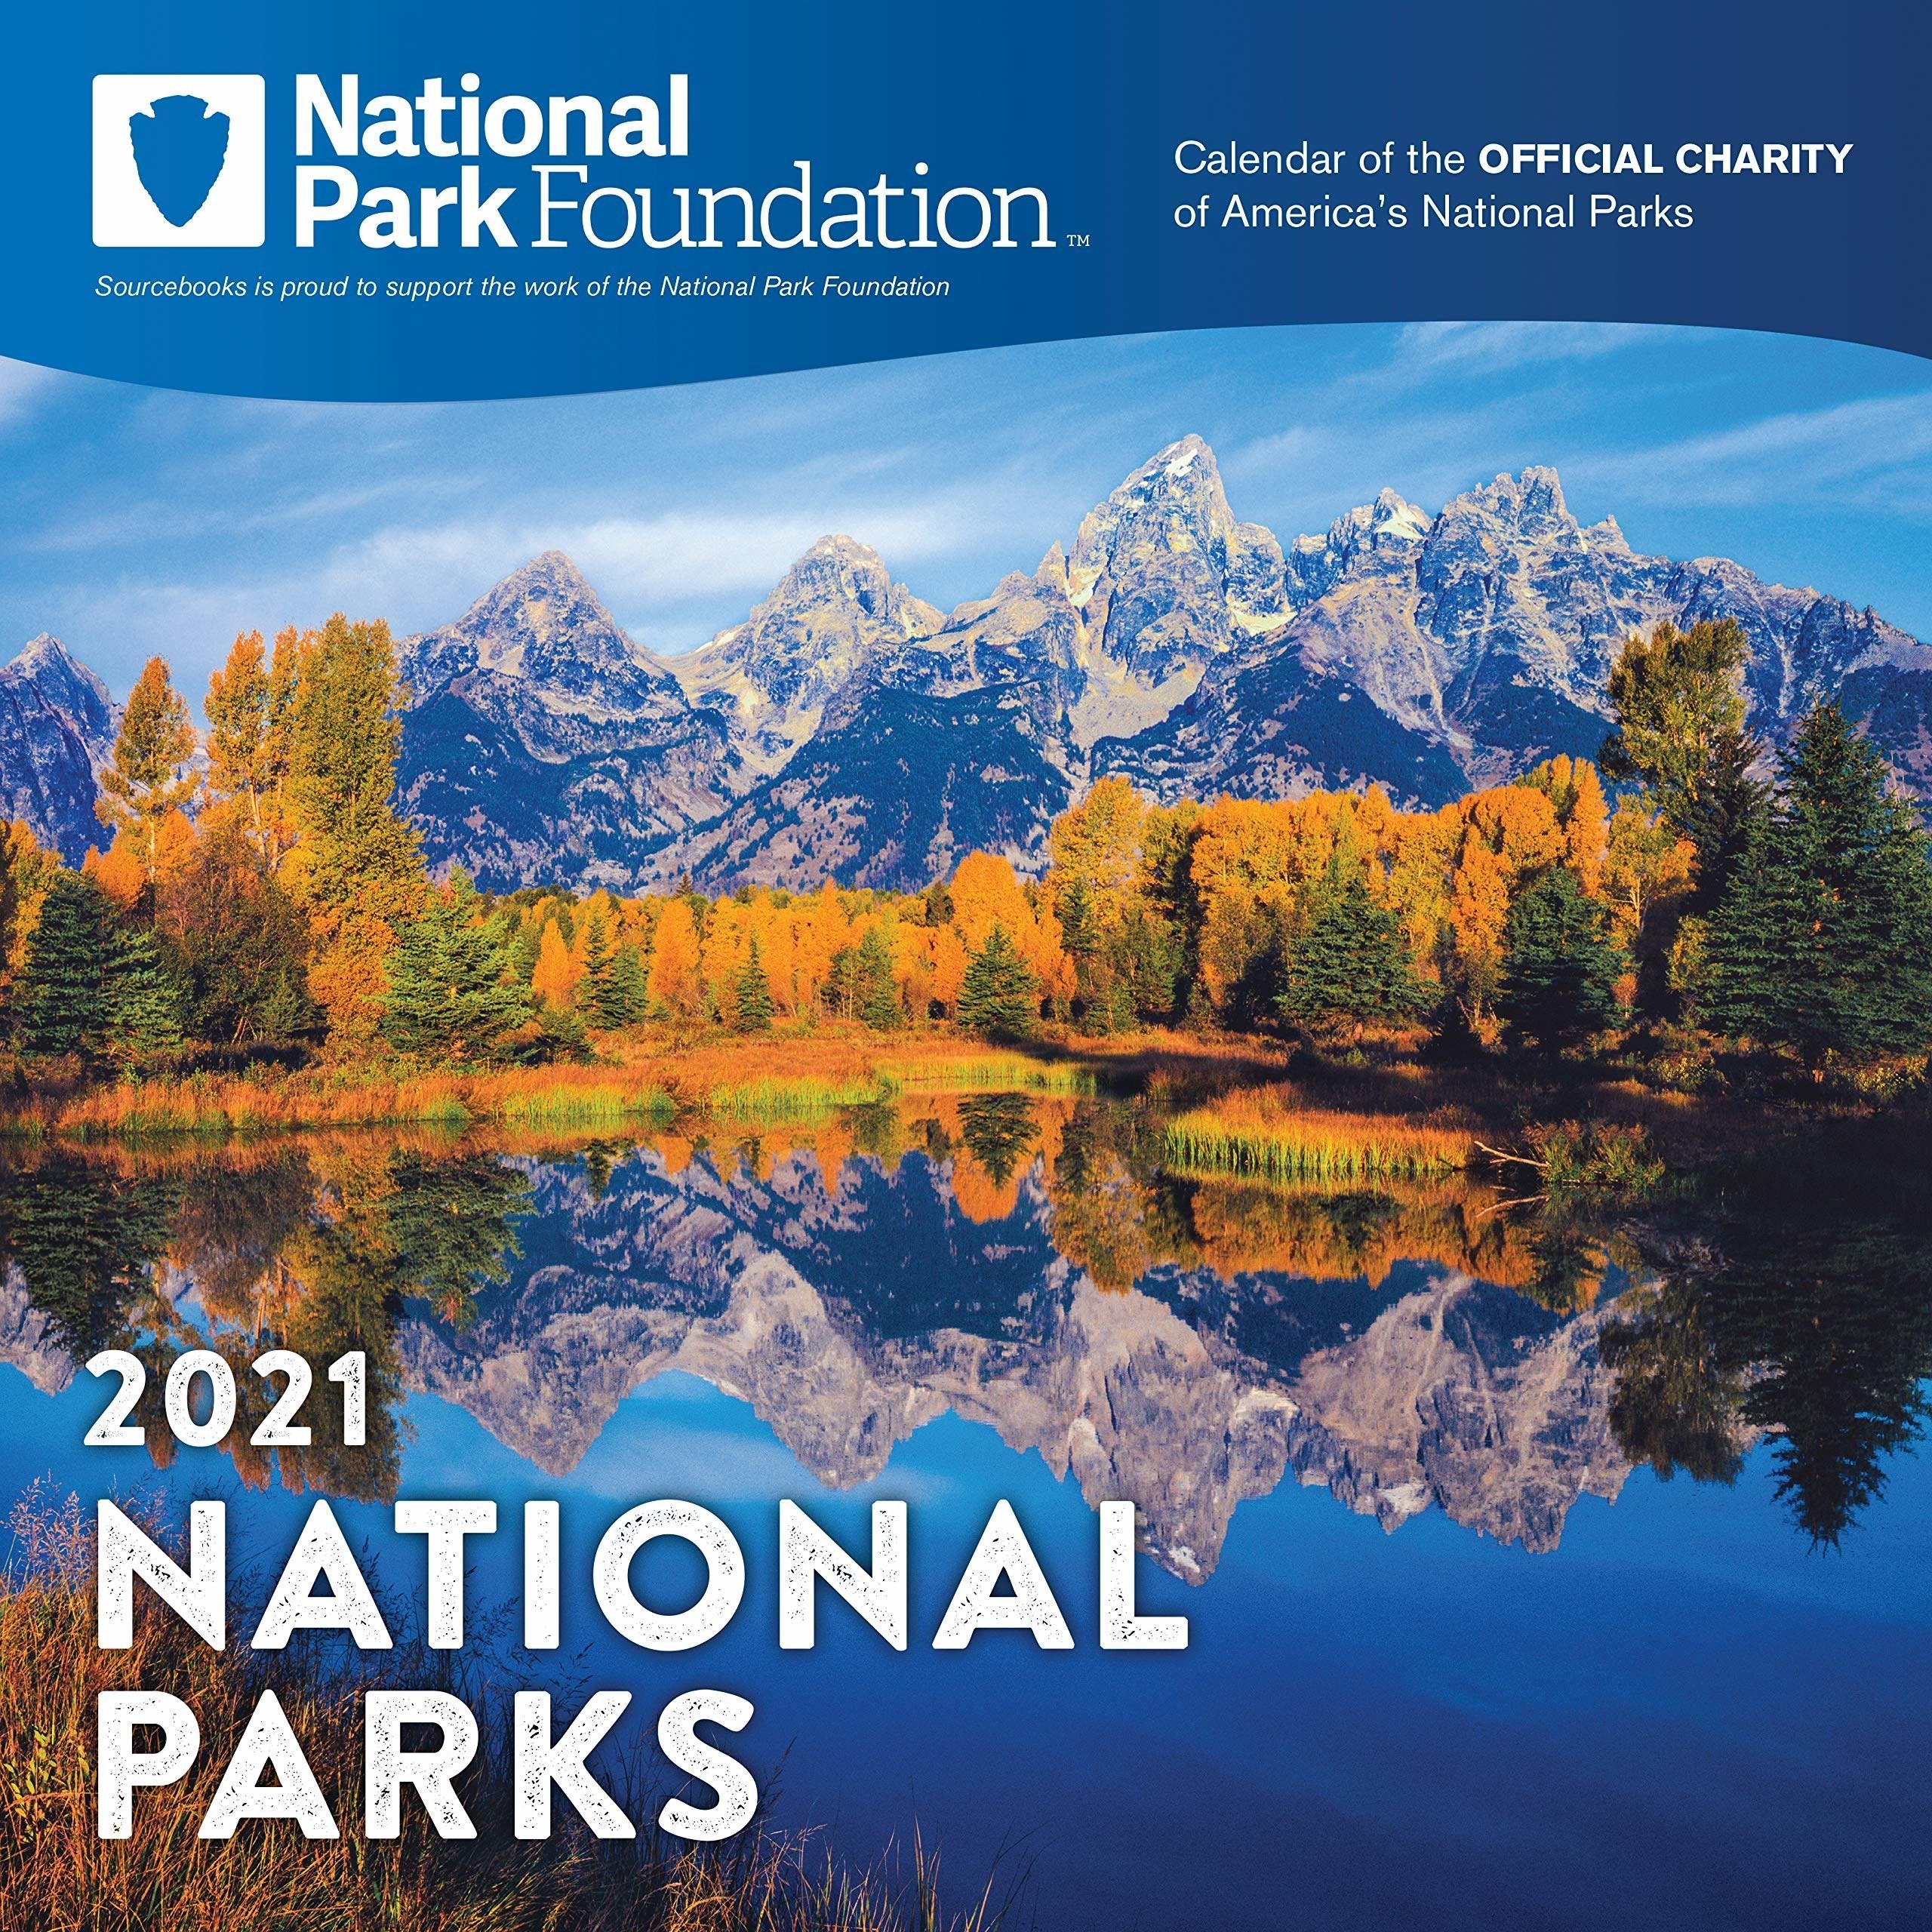 cover of the national park calendar